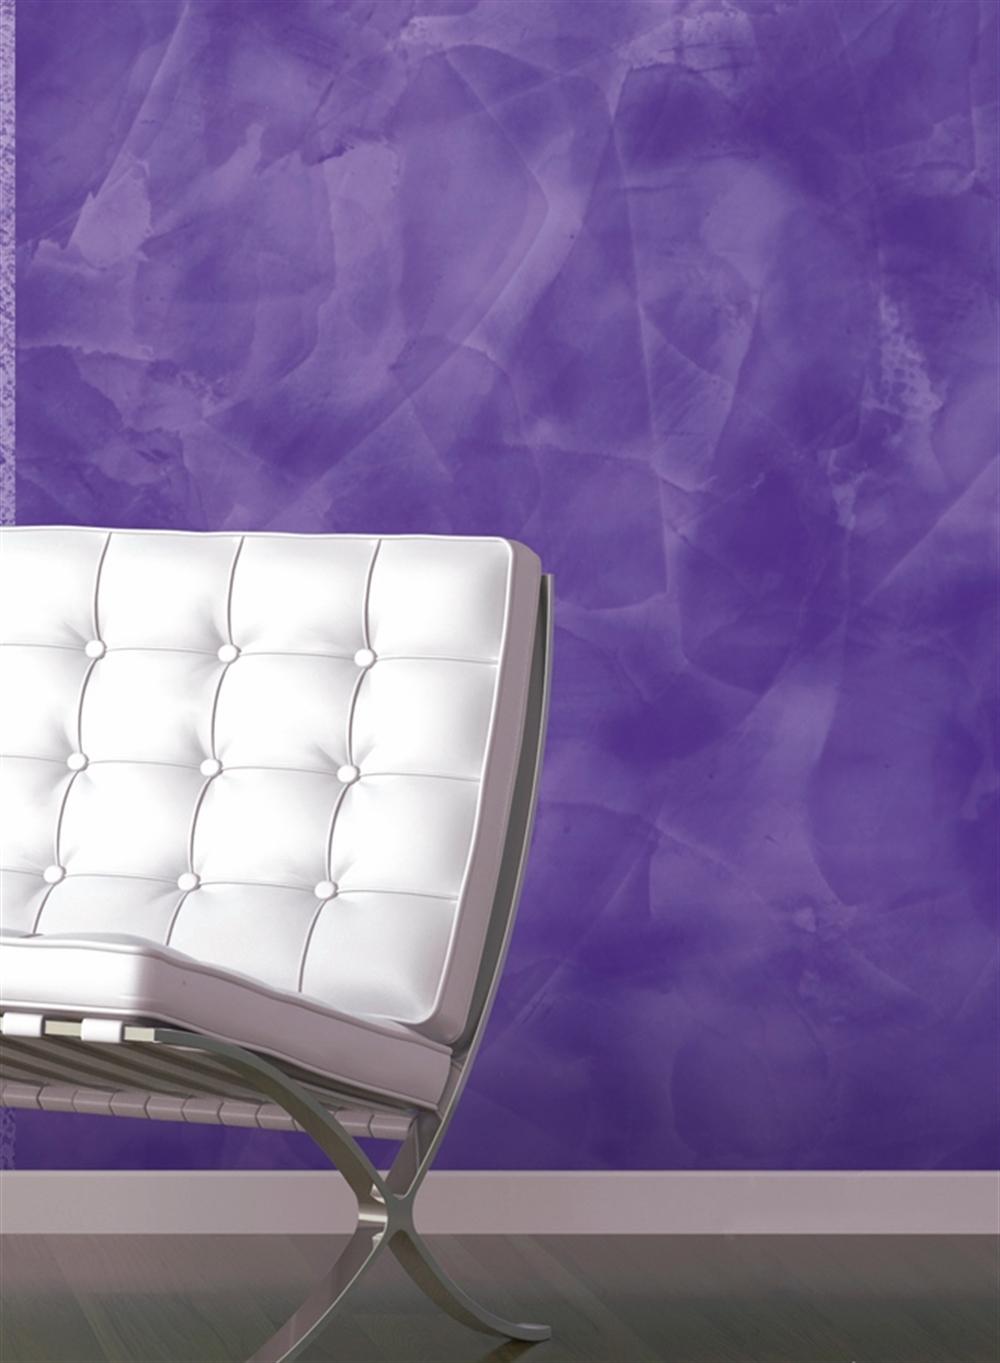 17 Stucco candis  benjamin moore wall efects painting malowanie scian faktura interior design apartment renovating malowanie mieszkania remont